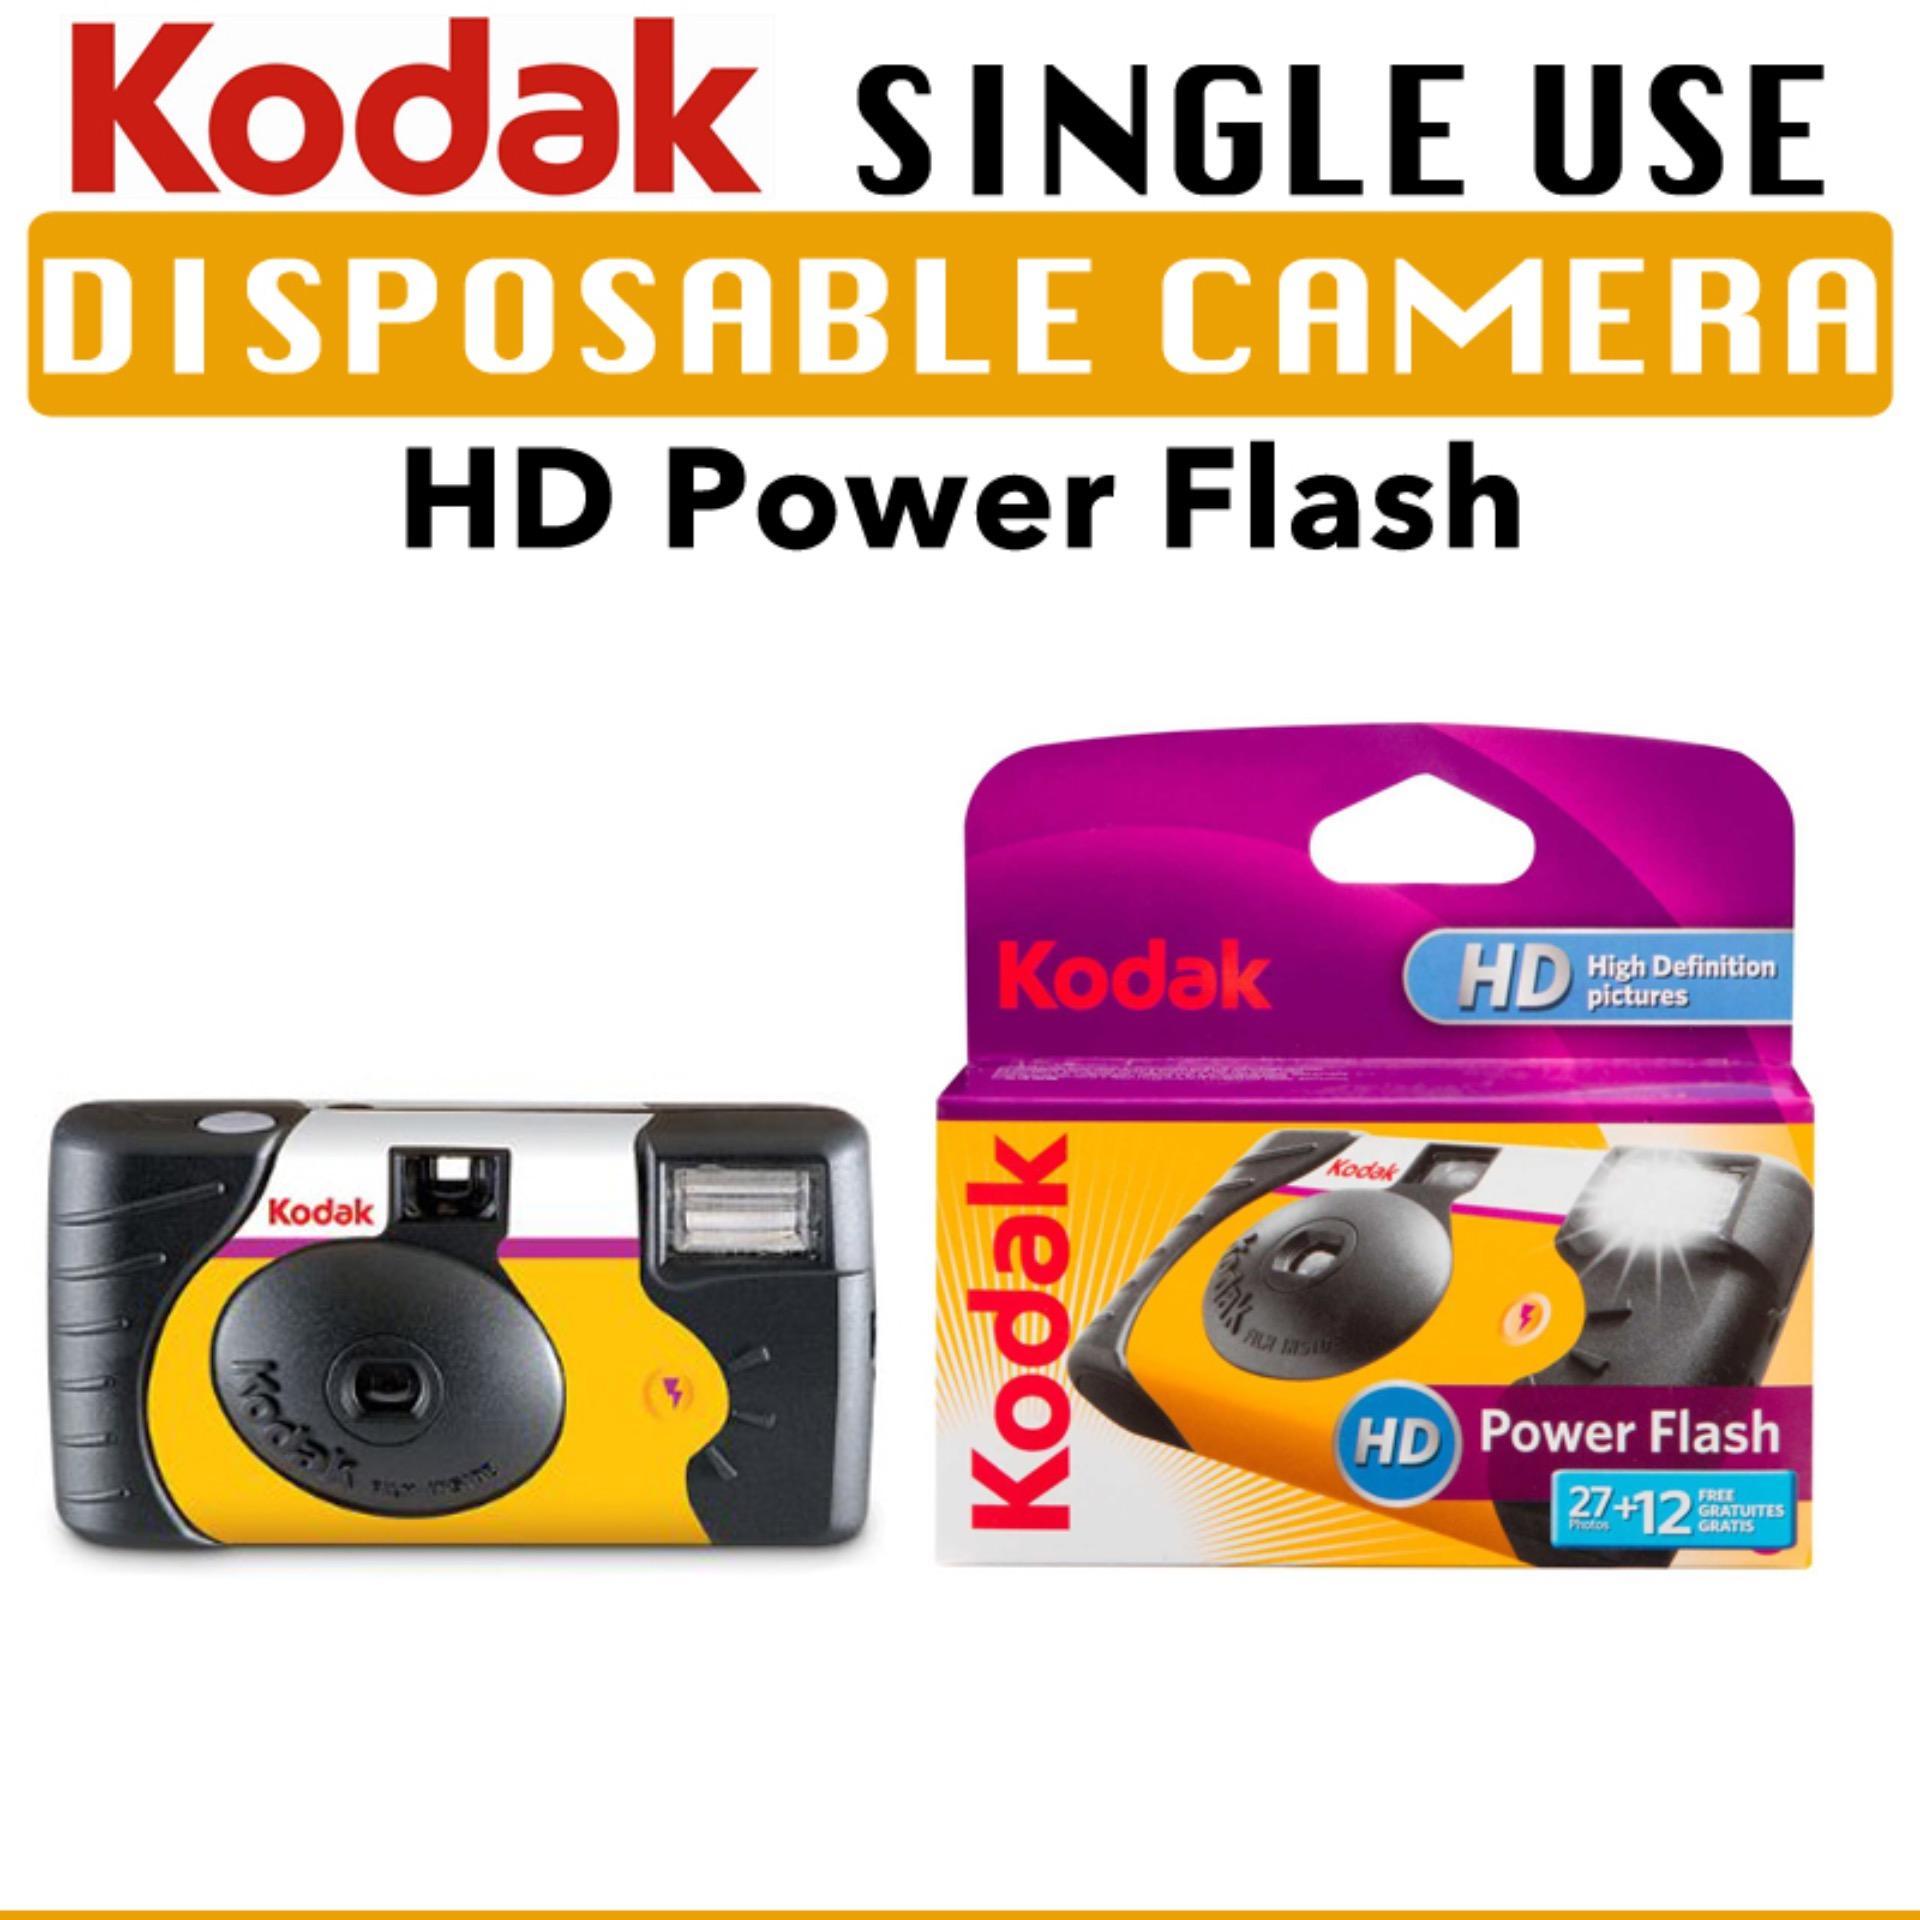 KODAK Power Flash Single Use Disposable Camera